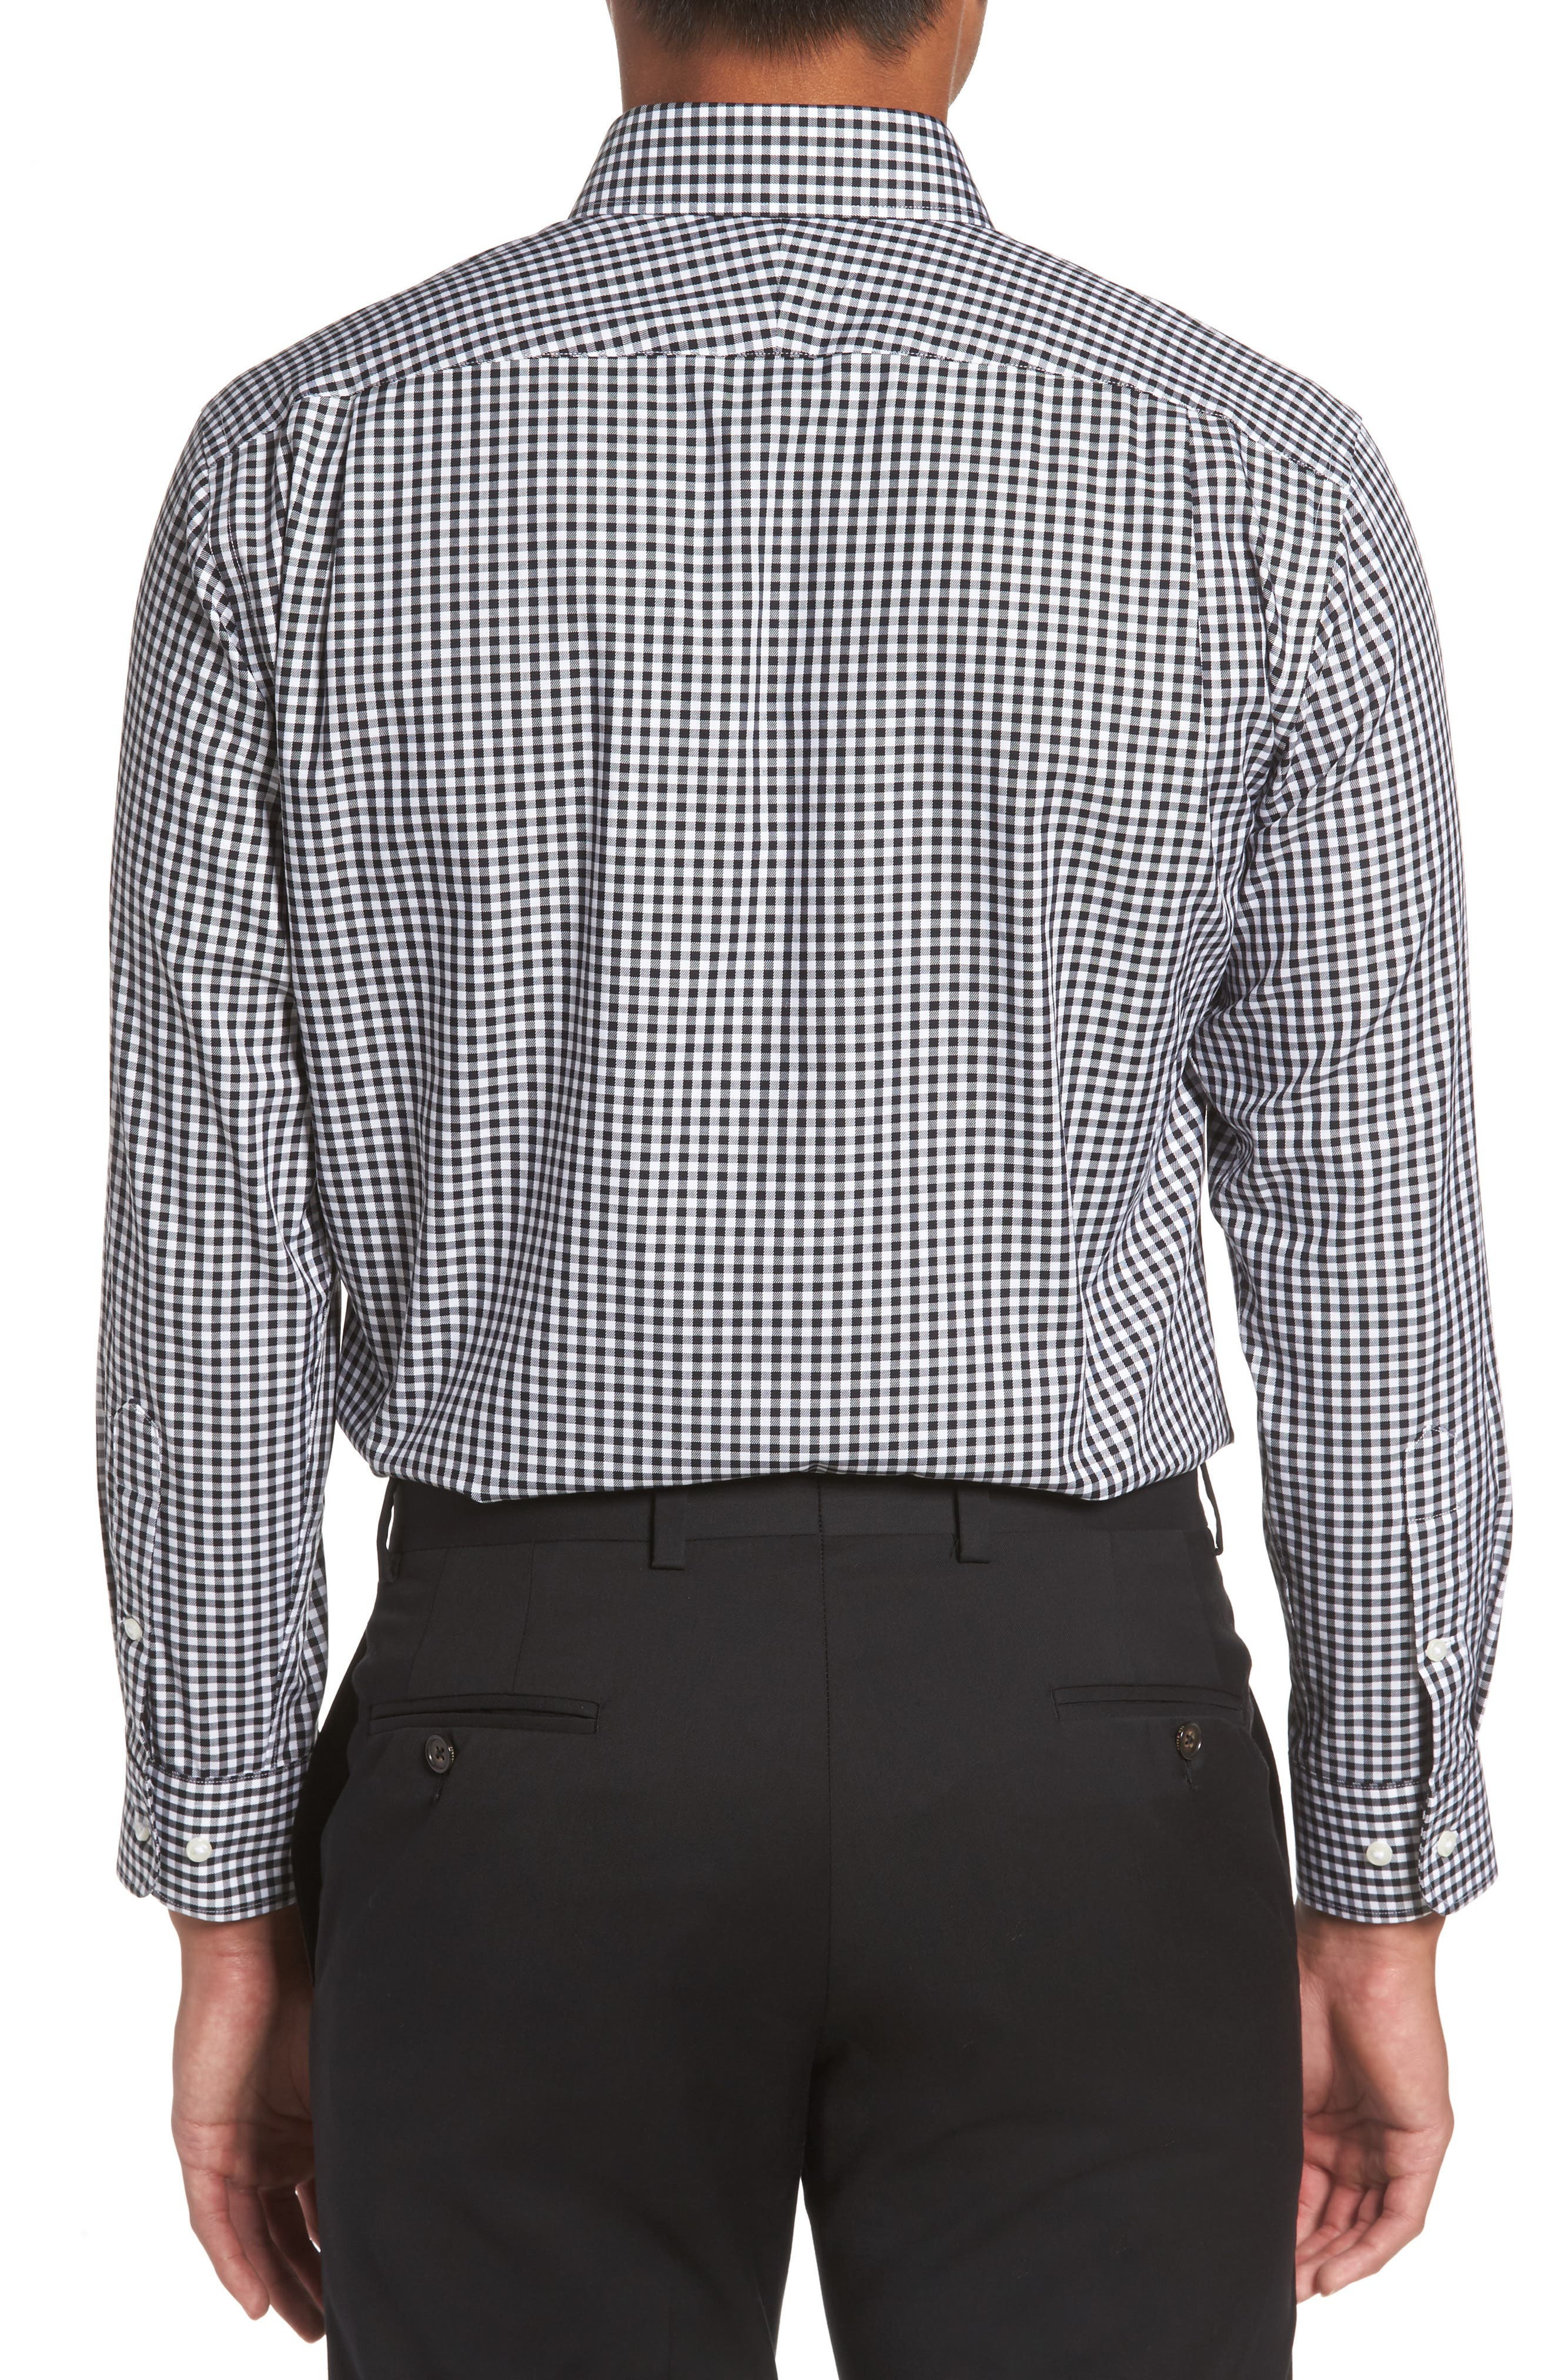 Trim Fit Non-Iron Gingham Dress Shirt,                             Alternate thumbnail 2, color,                             BLACK ROCK